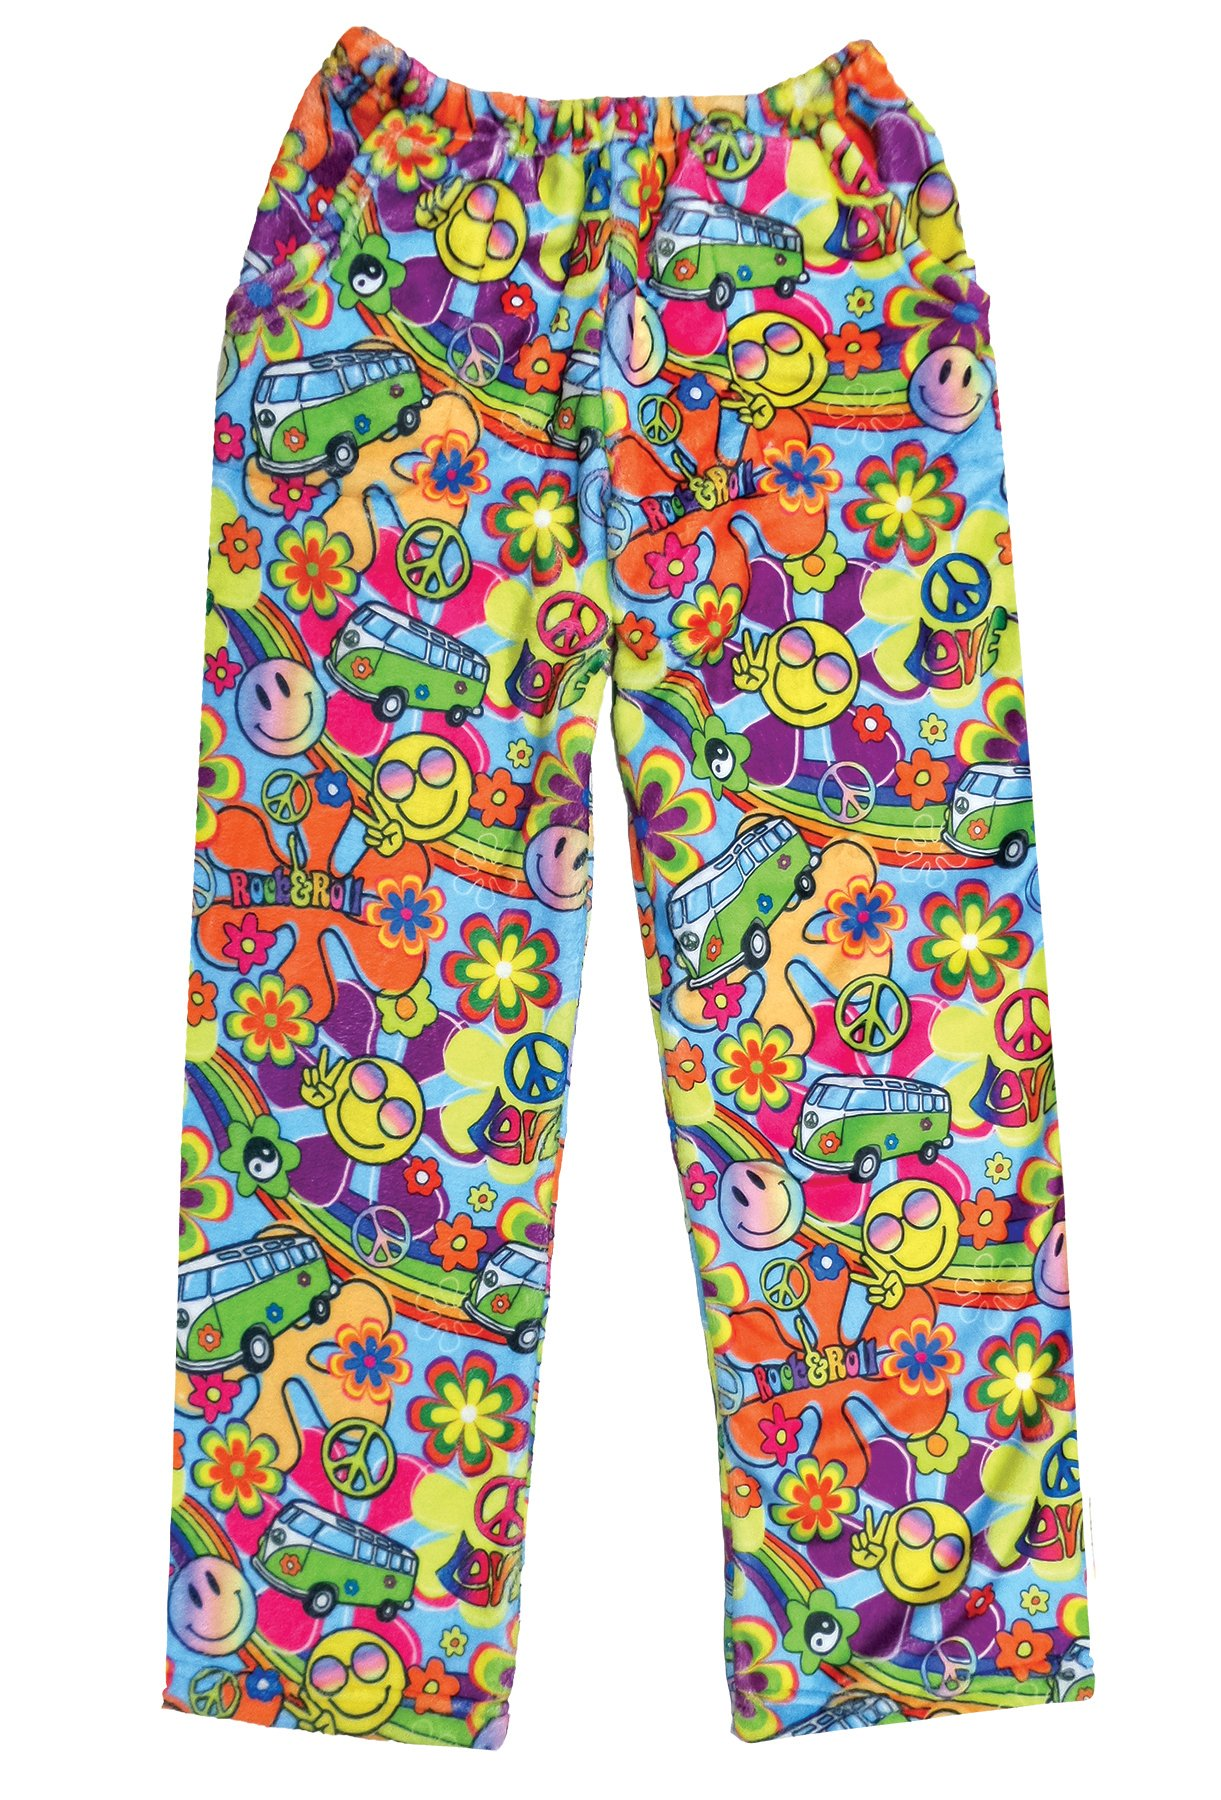 iscream Big Girls Fun Print Silky Soft Plush Pants - Summer Love, Large